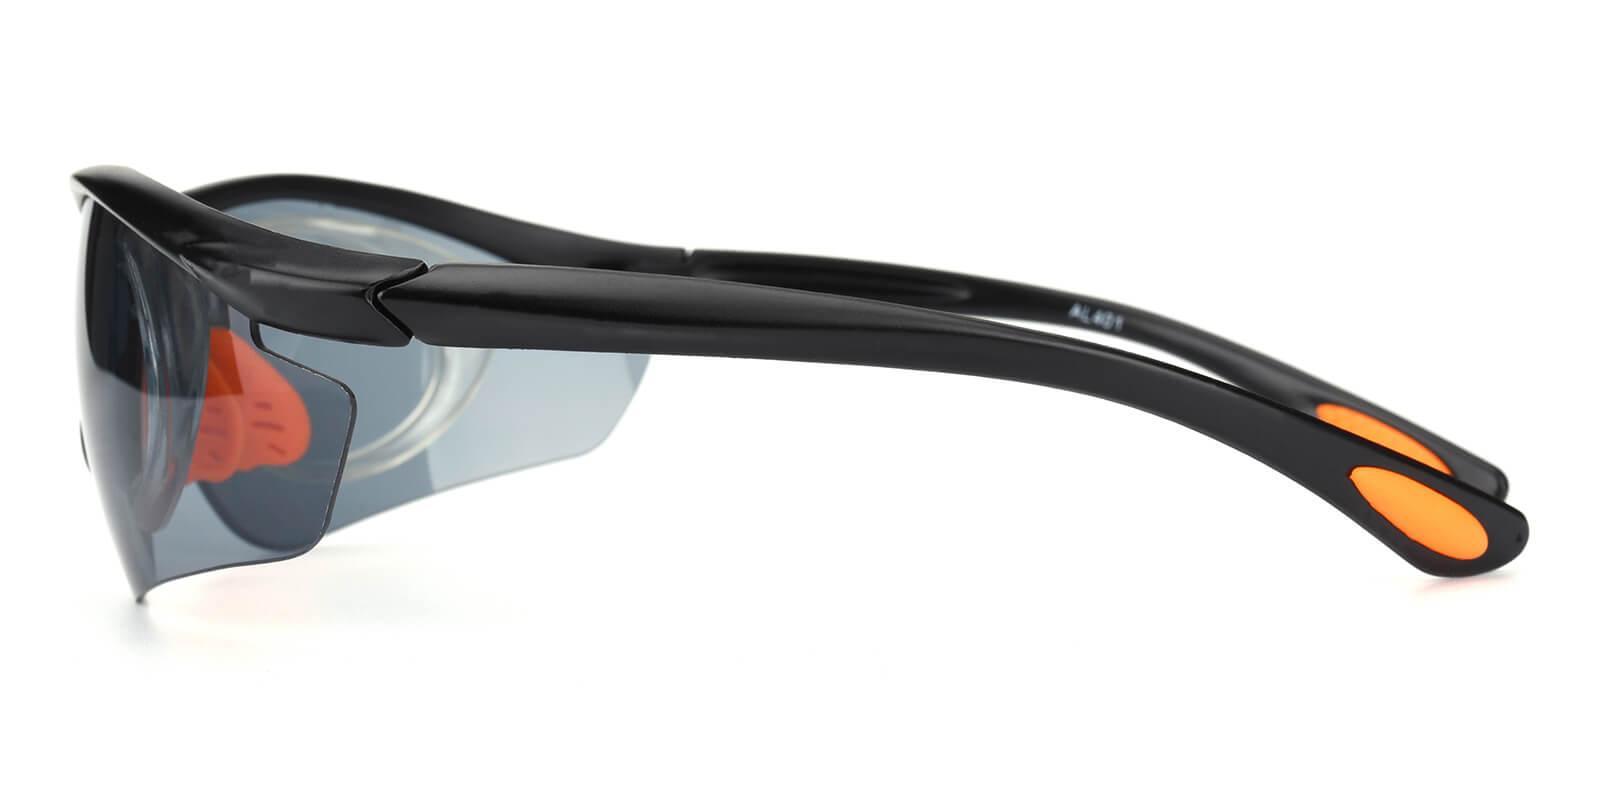 Preavey-Black-Square-Plastic-SportsGlasses-additional3